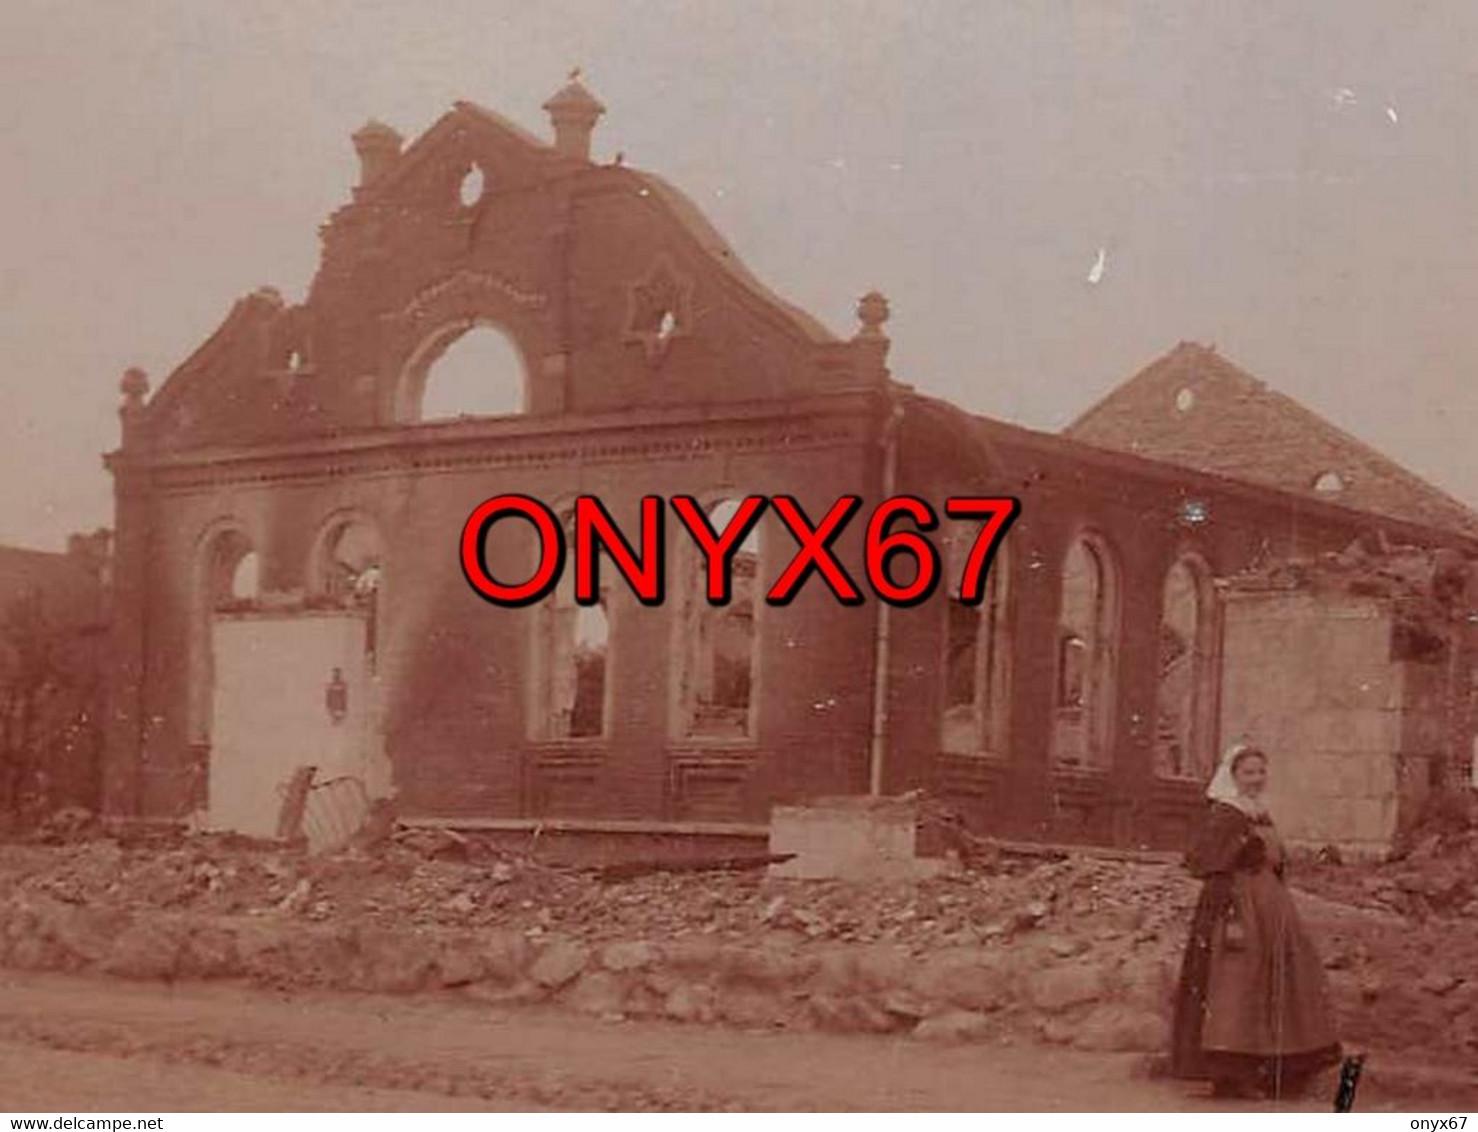 Carte Postale Photo SCHAULEN-Szawle-Siauliai-Lituanie-Lituania-SYNAGOGUE-Synagoge-Synagoga-JUDAÏCA-JUDEN-JUIF-Krieg-RARE - Lithuania